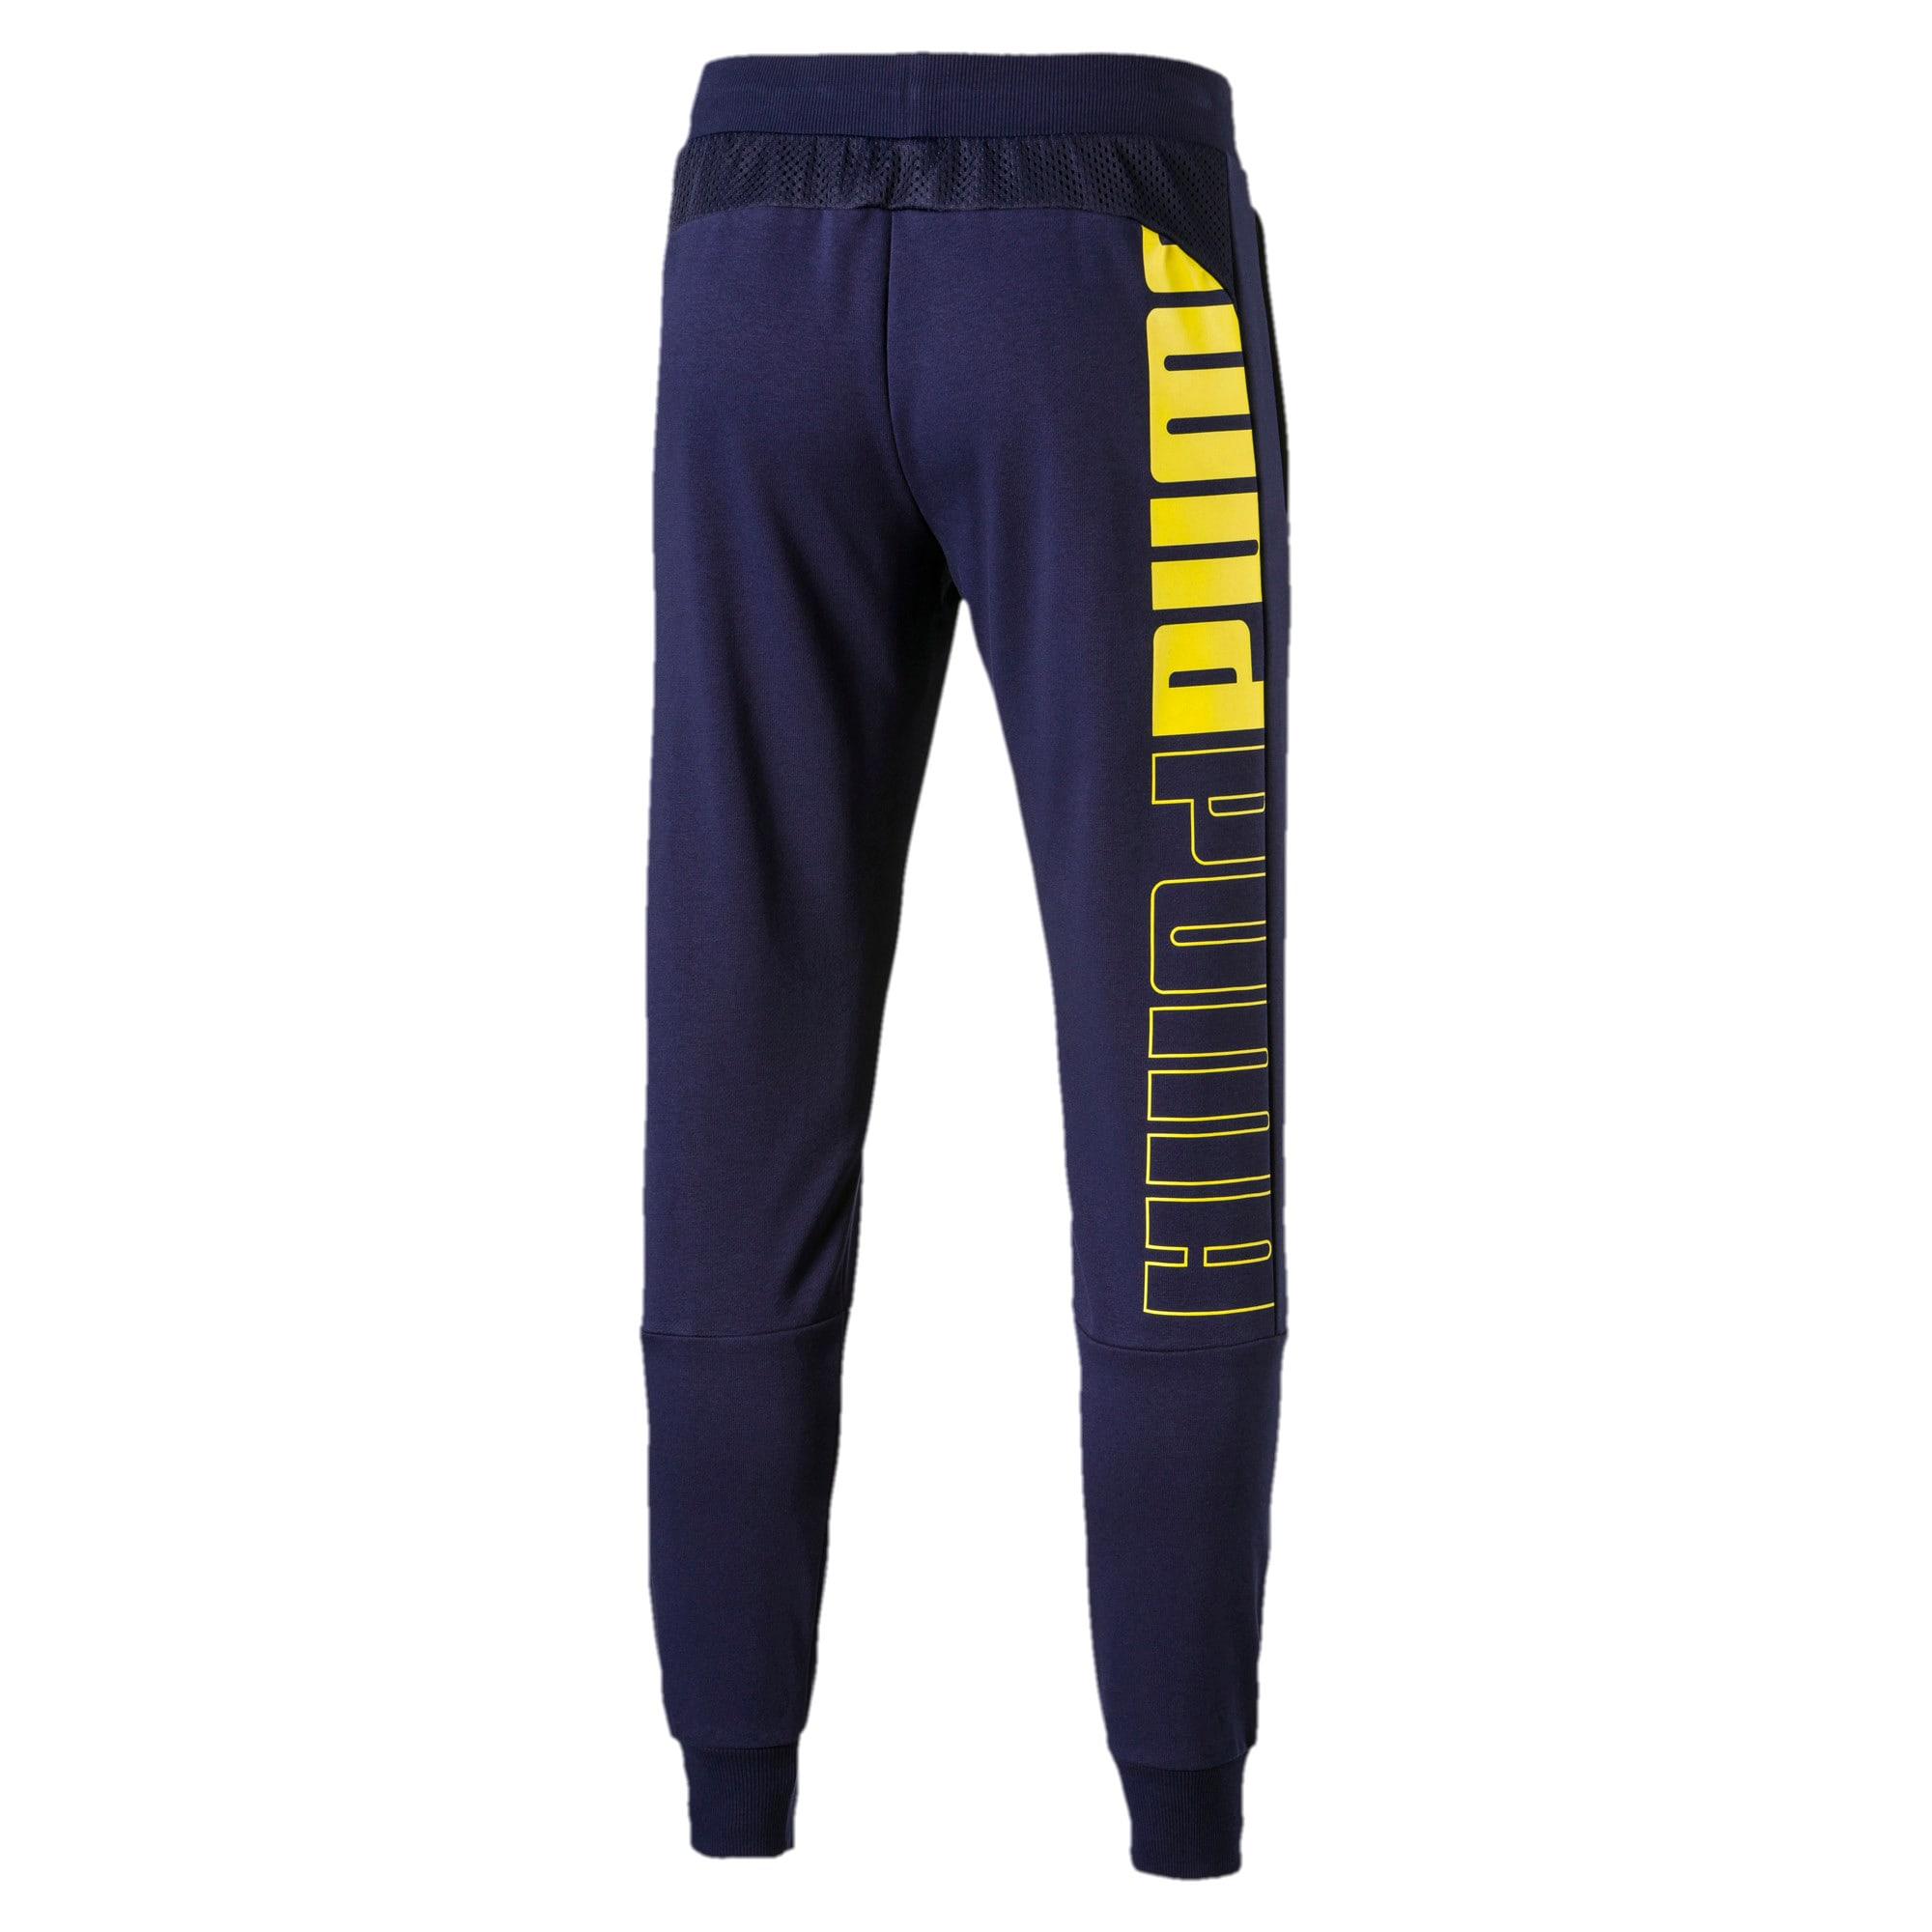 Thumbnail 2 of Modern Sports Pants, Peacoat, medium